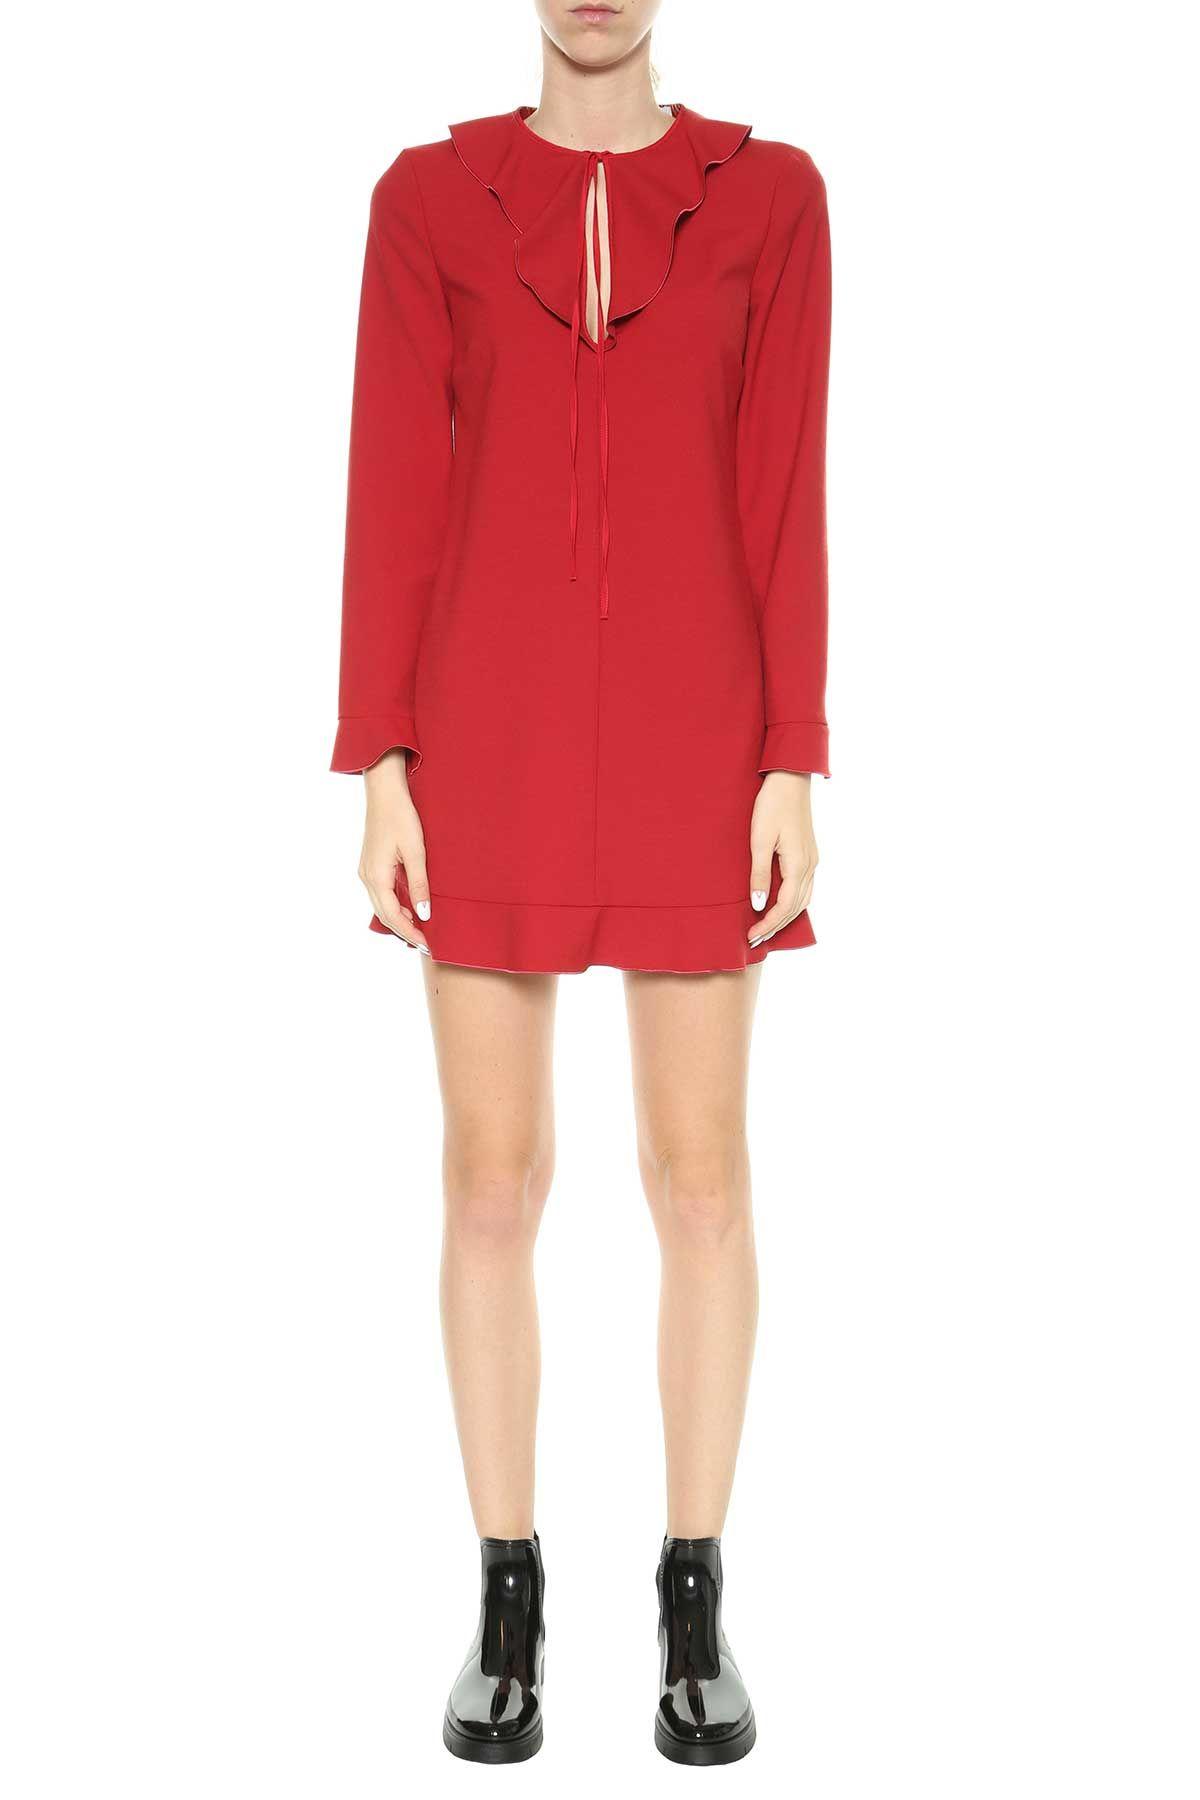 Red Valentino Red Valentino Short Dress With Frills